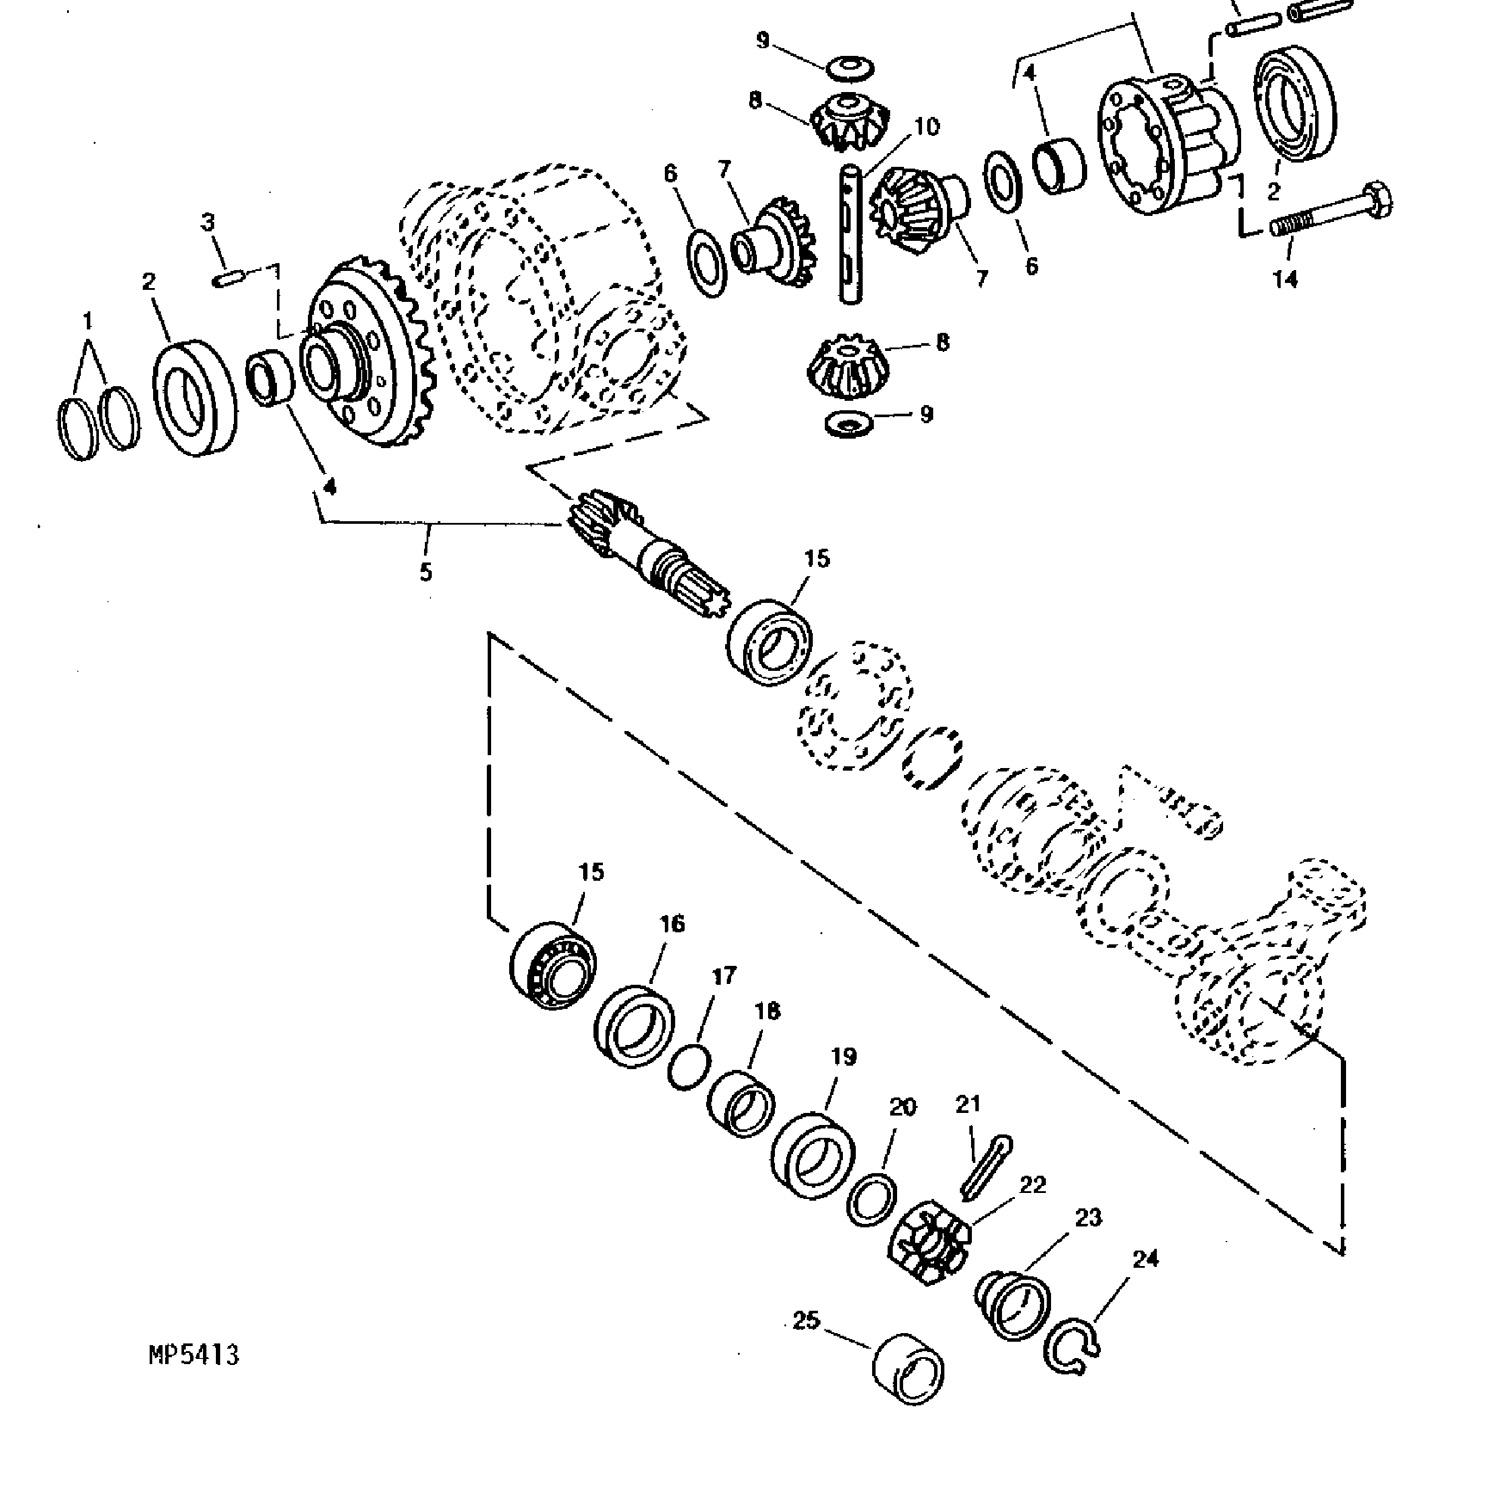 Buy Your Compact Tractor Parts Online Weavers John Deere 950 Wiring Harness Front Axle Seal 4wd